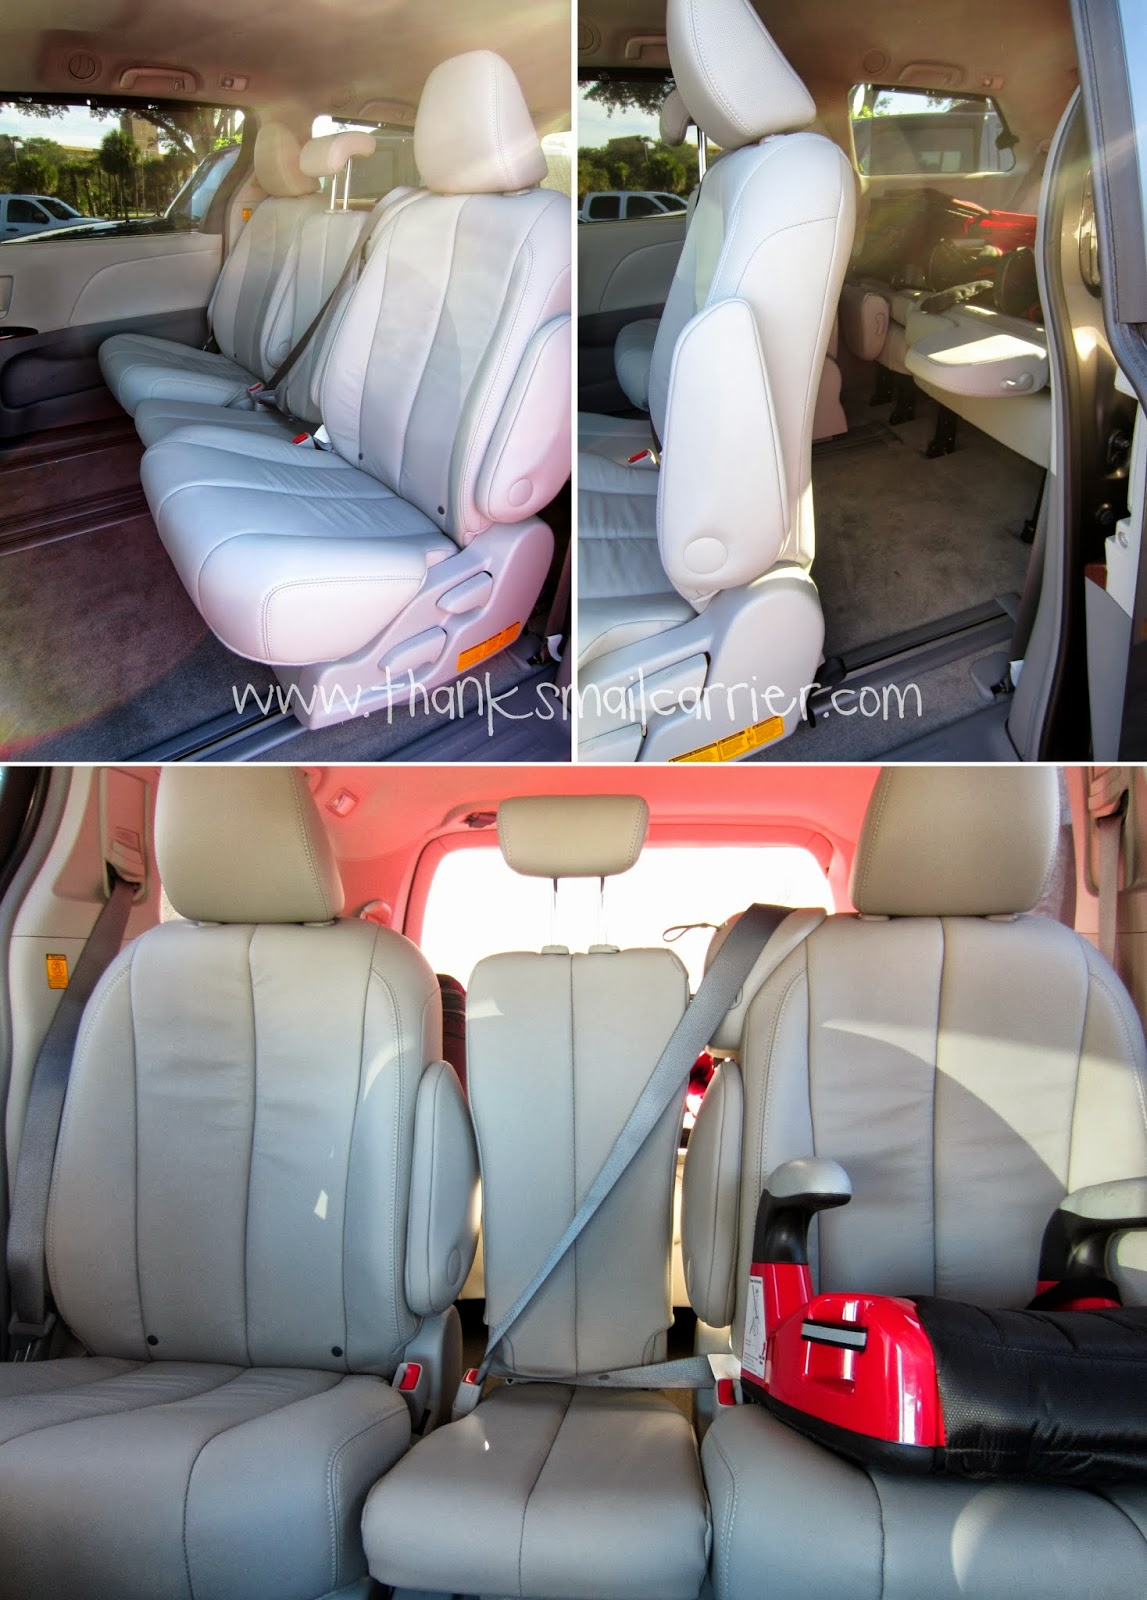 Toyota Sienna seating